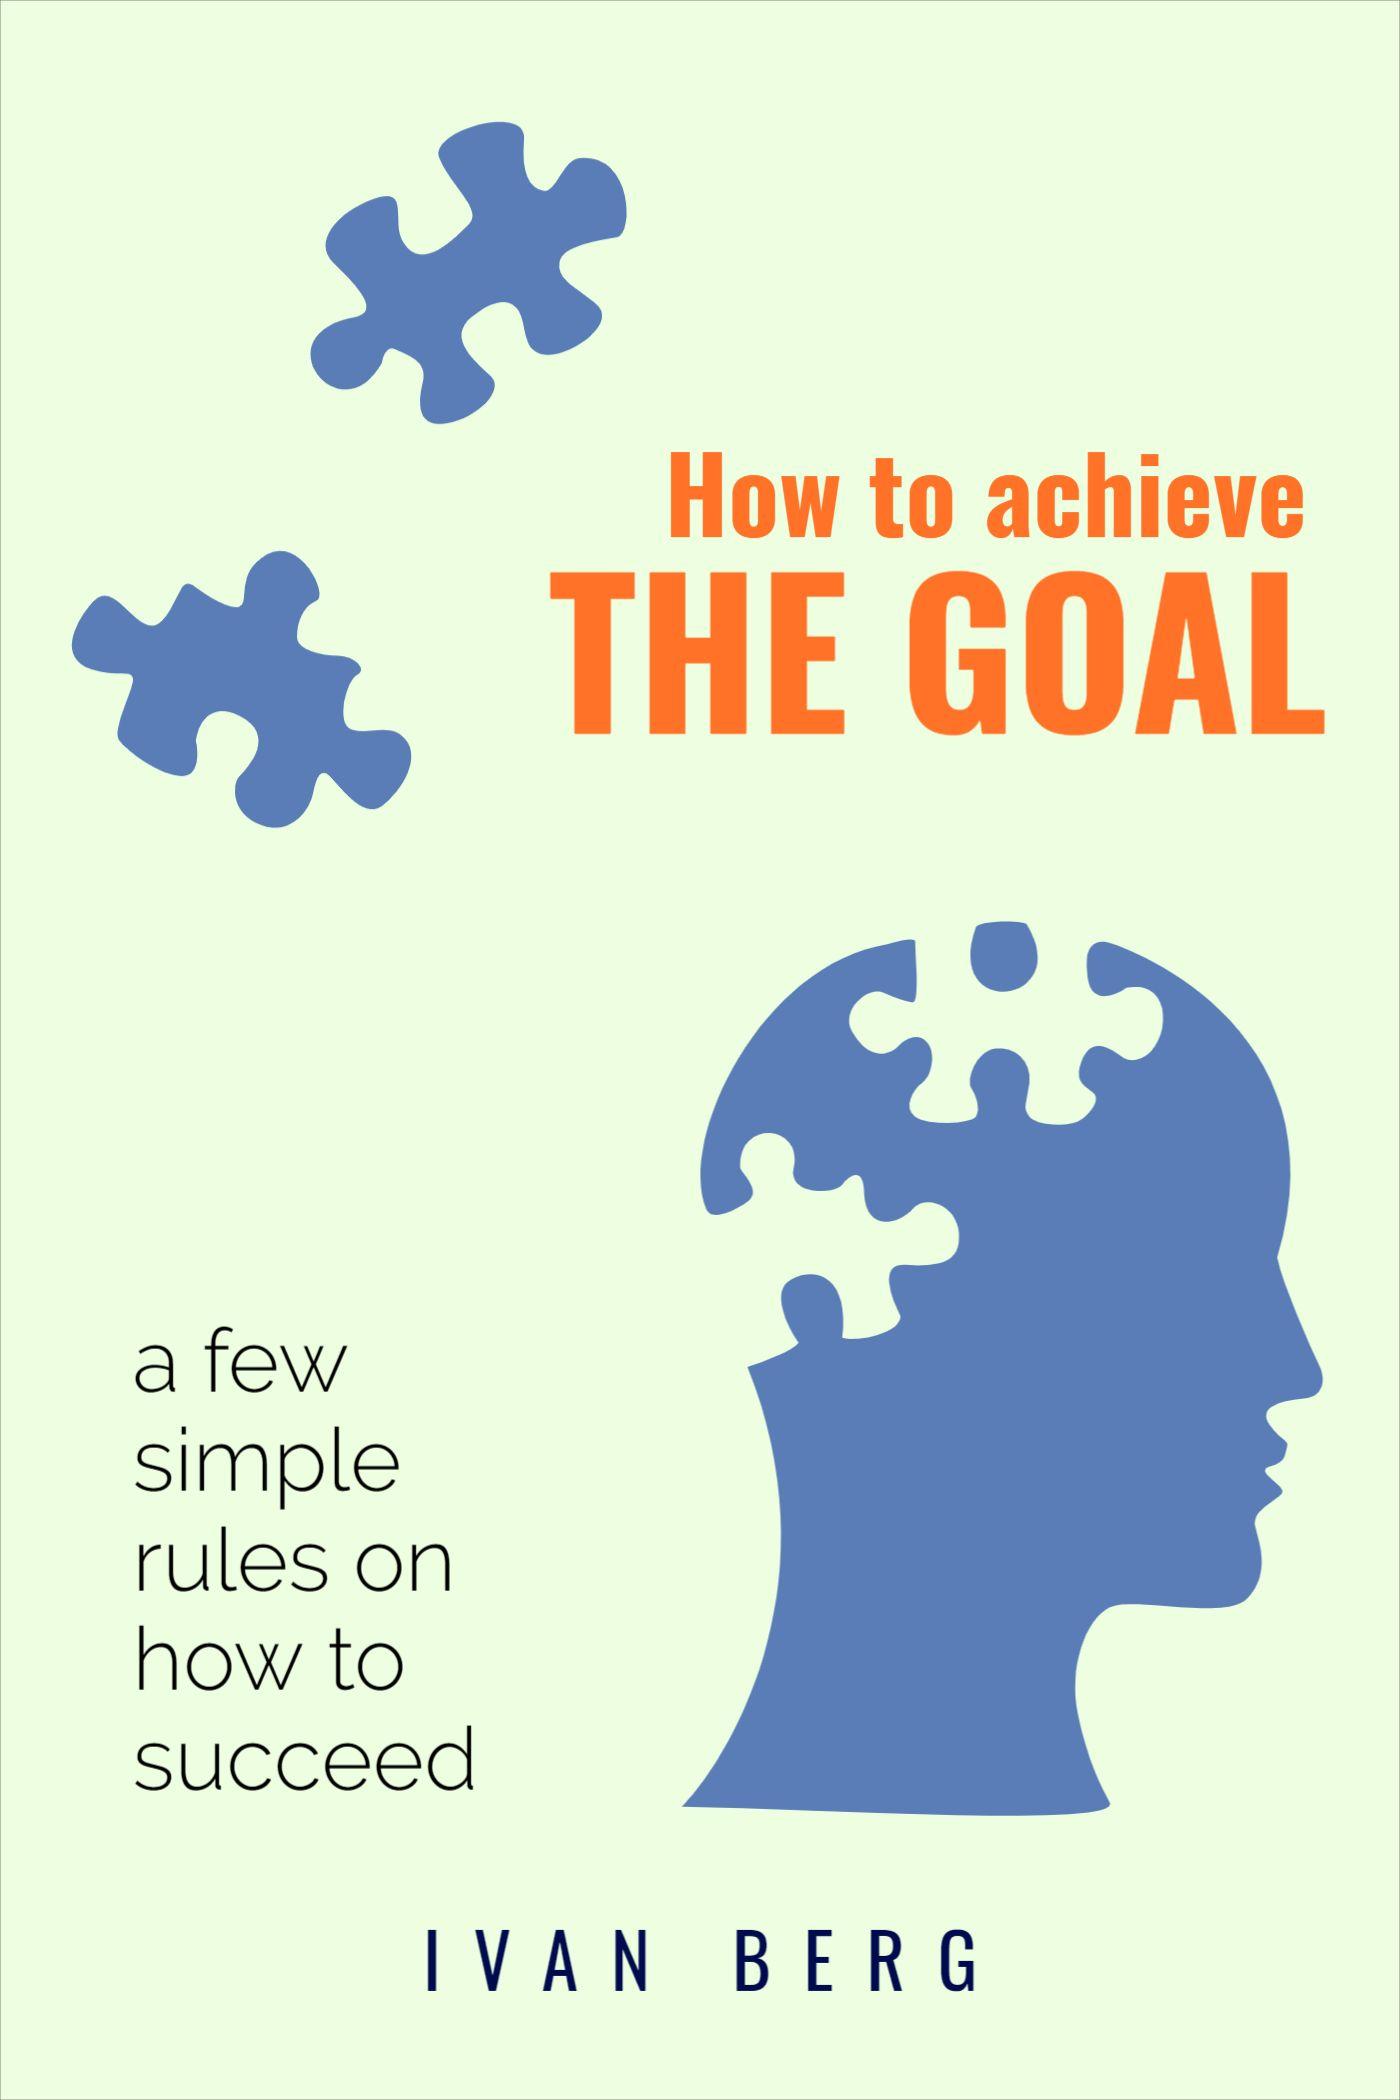 Success Book Cover Template